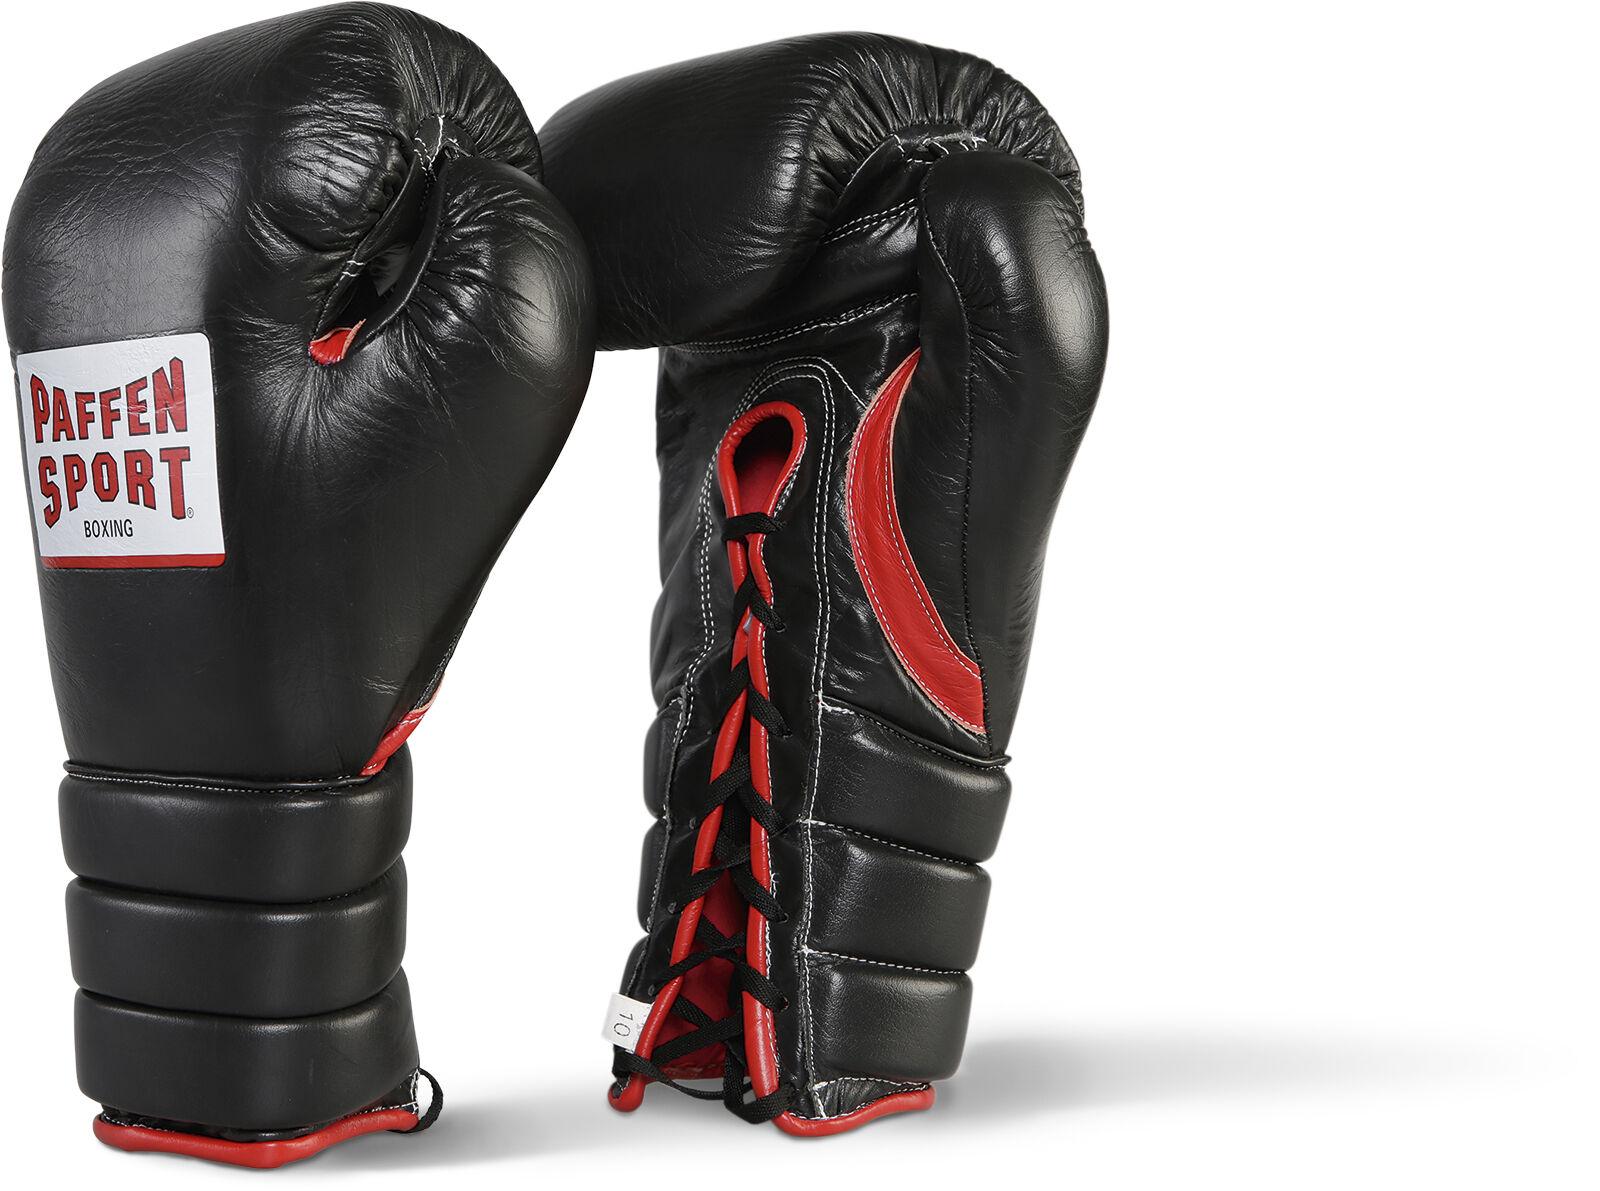 Paffen Sport Pro Guard Boxhandschuhe. Wettkampf. Boxen. Schnürrung, 8 od. 10oz